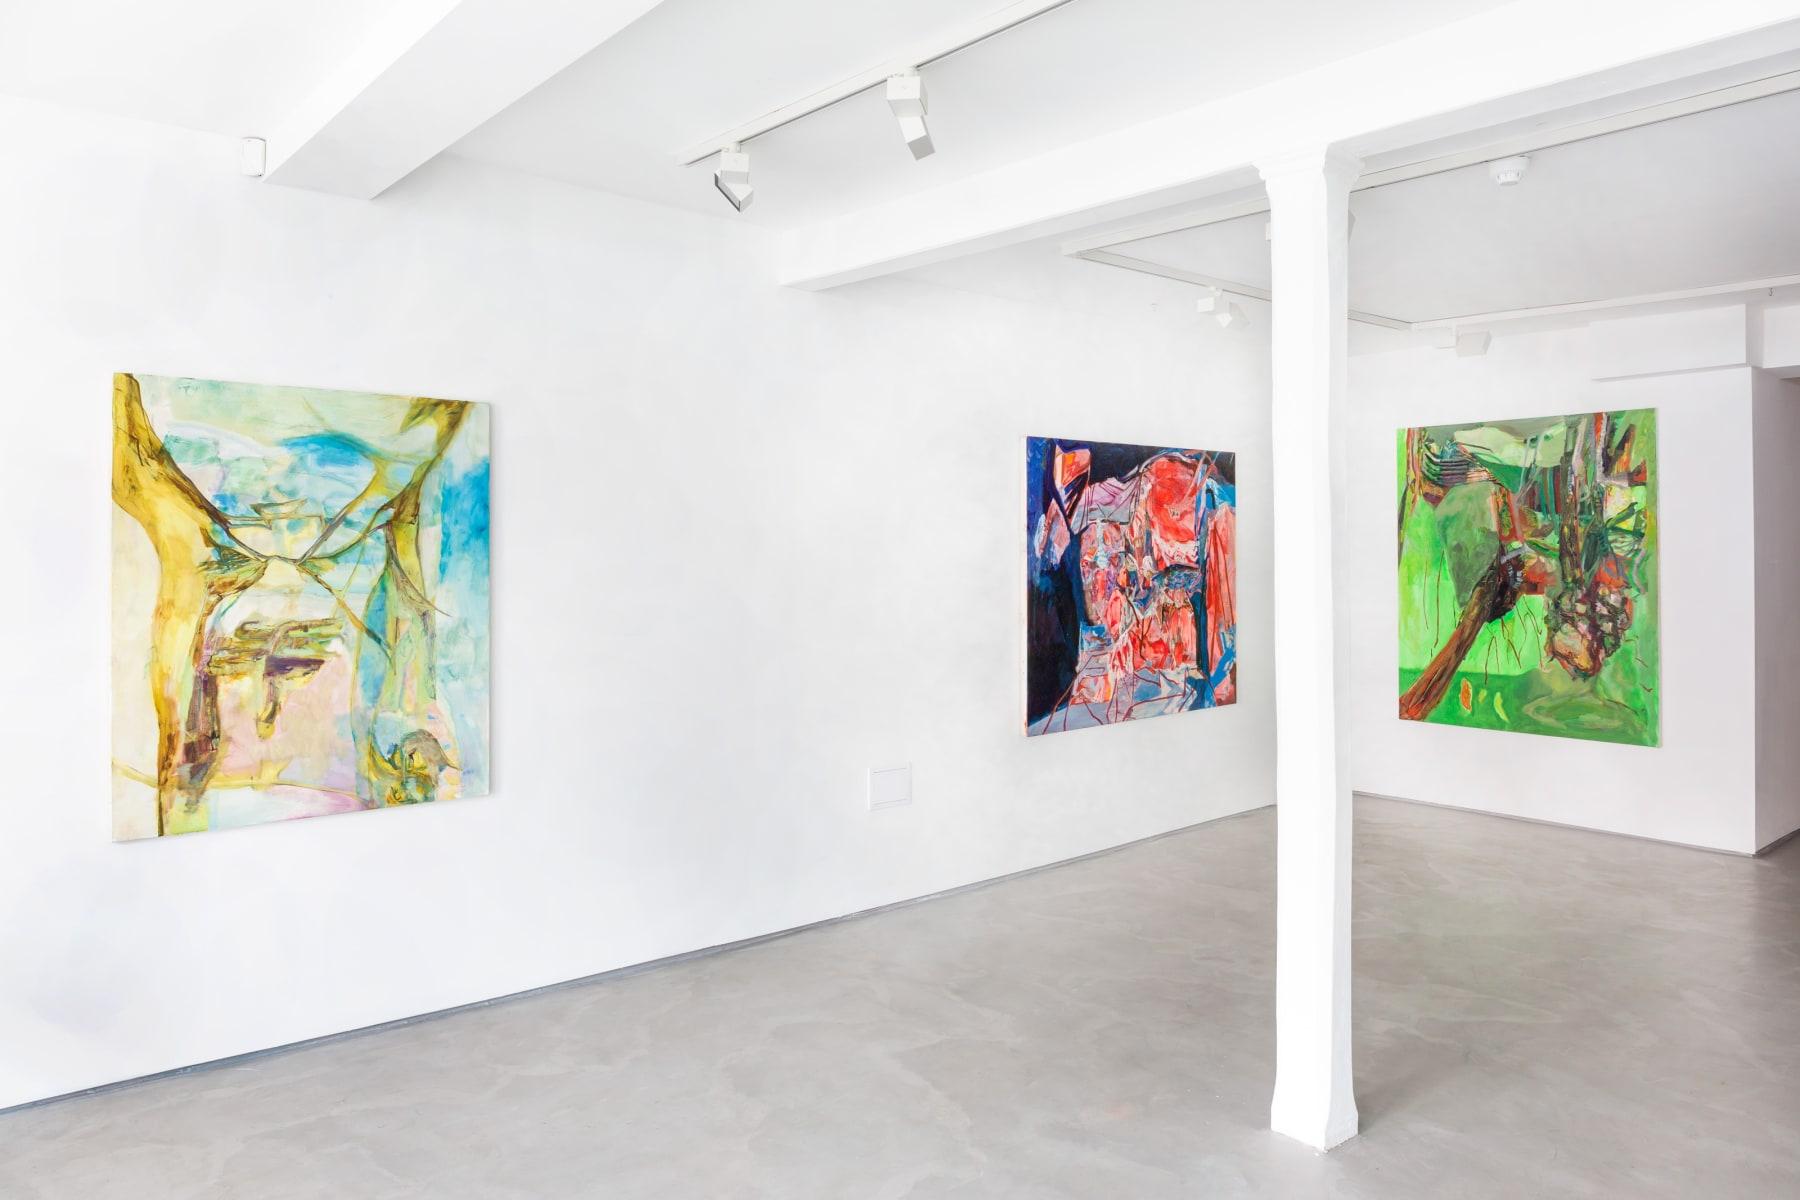 Francesca Mollett, Wild Shade, Informality, Installation view 2021